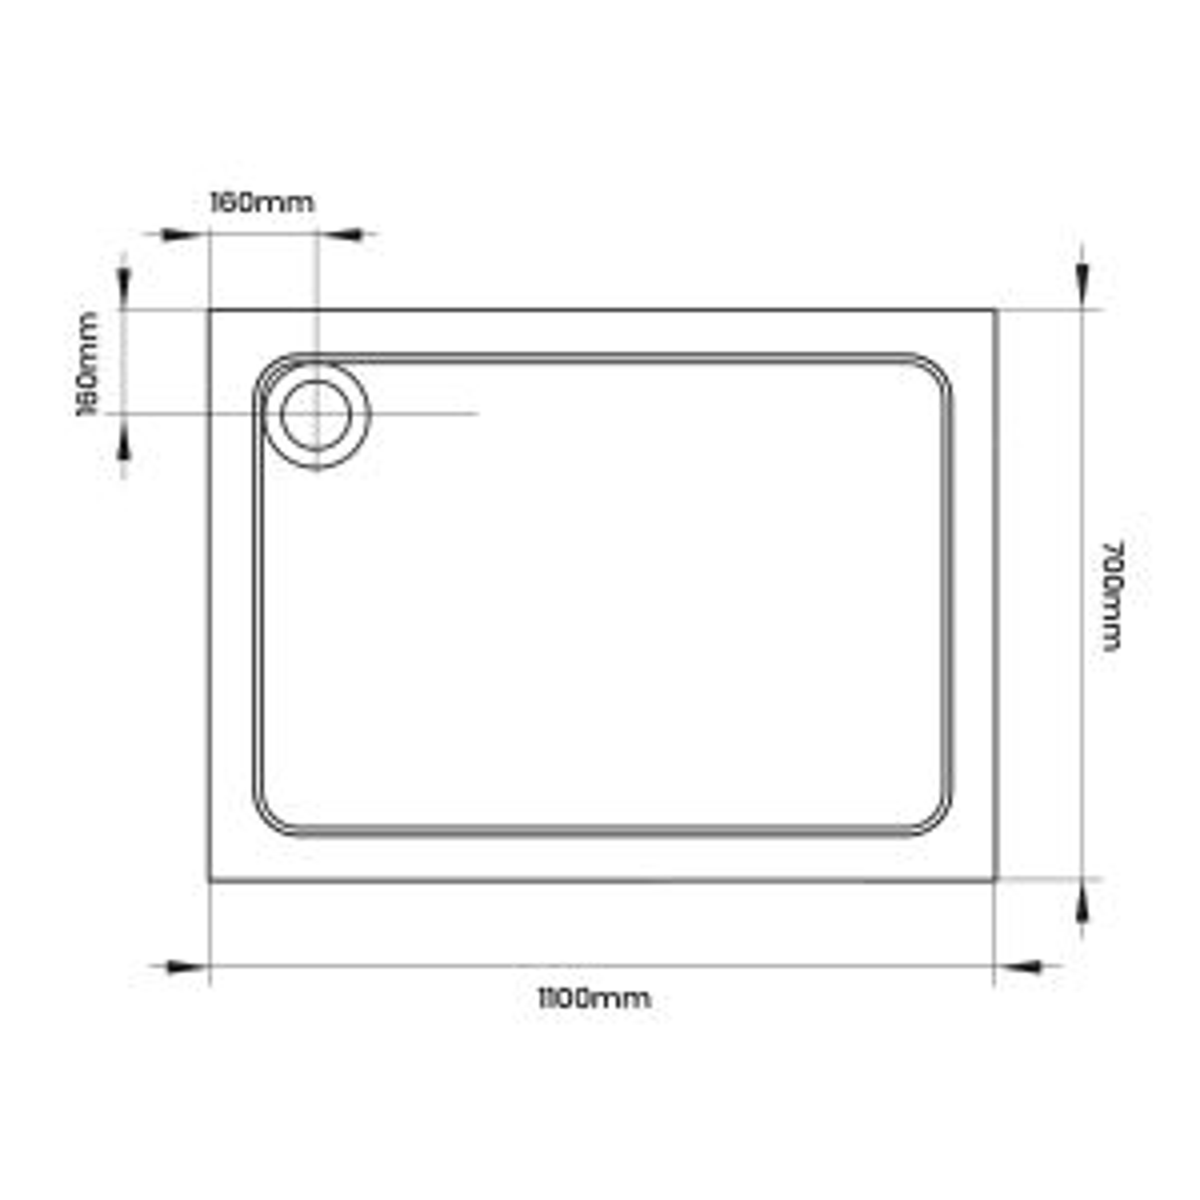 April Rectangular Anti Slip Shower Tray Measurements 1100 x 700